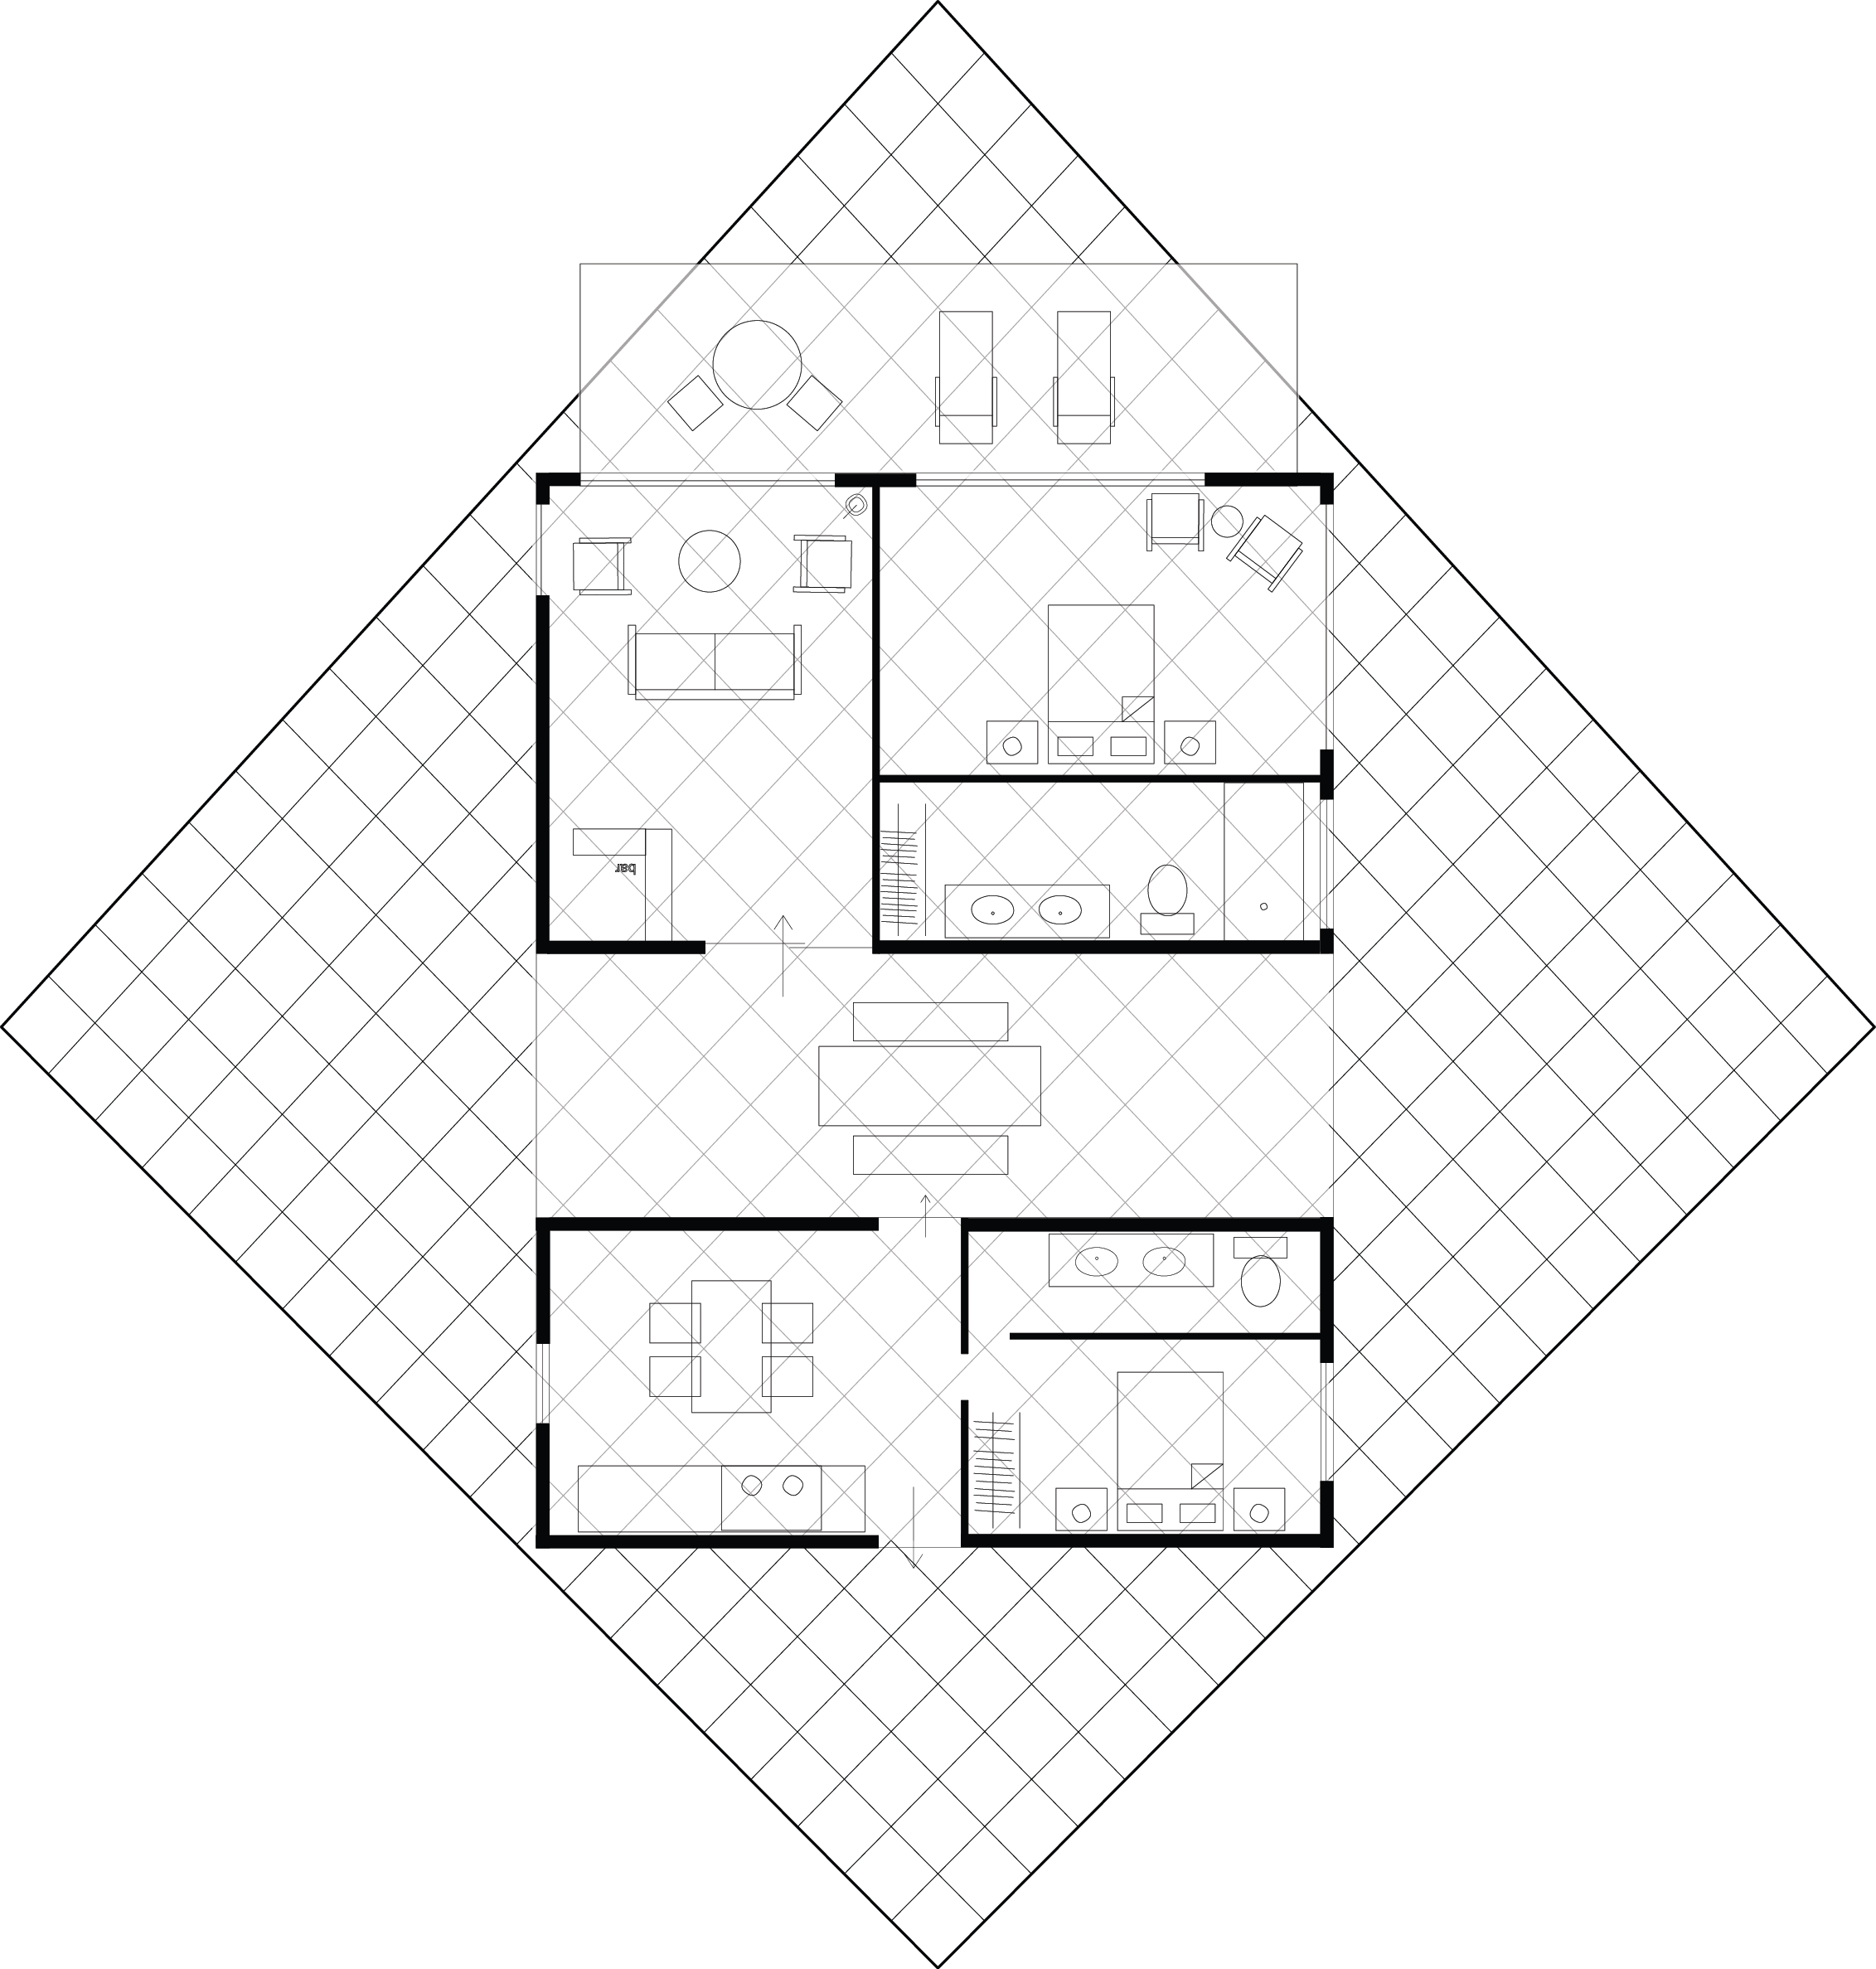 Guestroom plan dddone